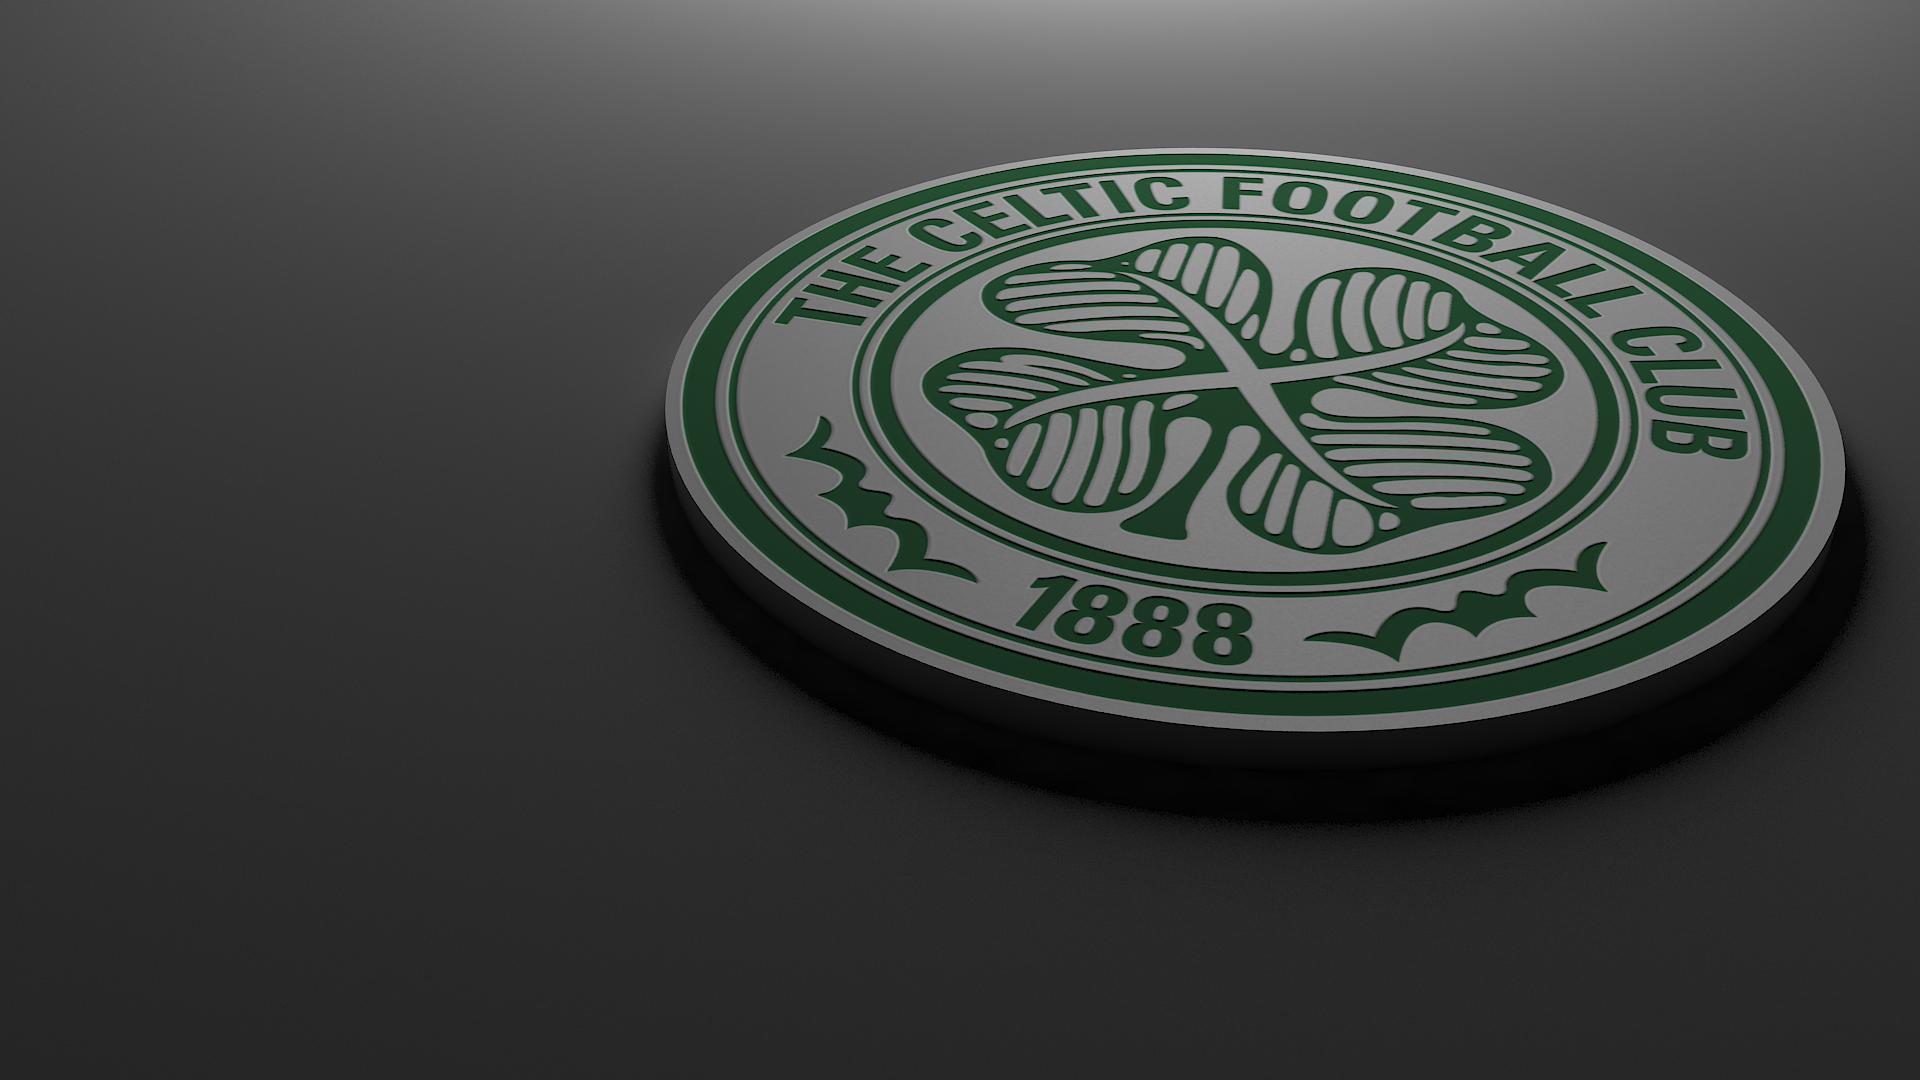 Celtic Fc 2017 Backgrounds